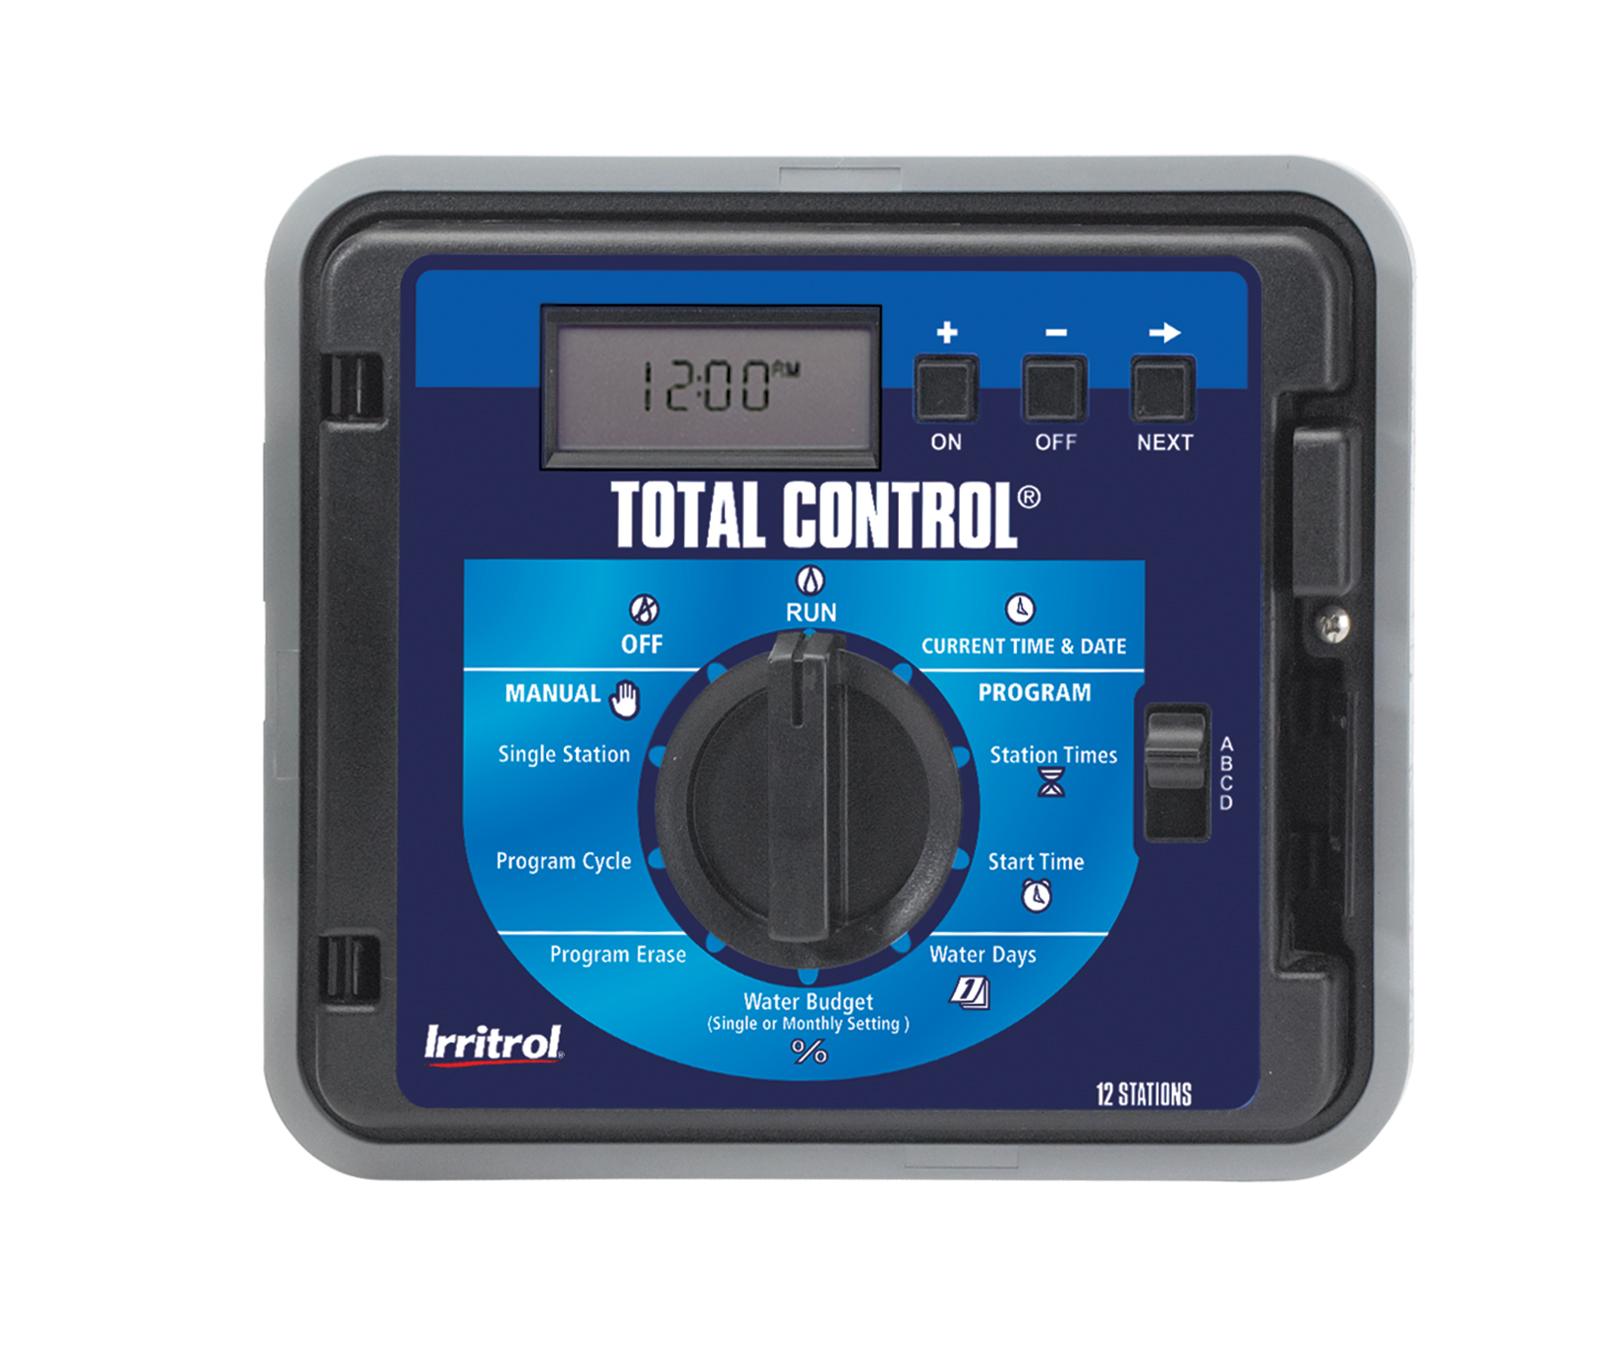 totalcontrol_studio.ashx?mw=700&mh=599&hash=6EFAD1DBB6895035AC59BC700E5A0A80979D3319 irritrol total control r series Basic Electrical Wiring Diagrams at honlapkeszites.co